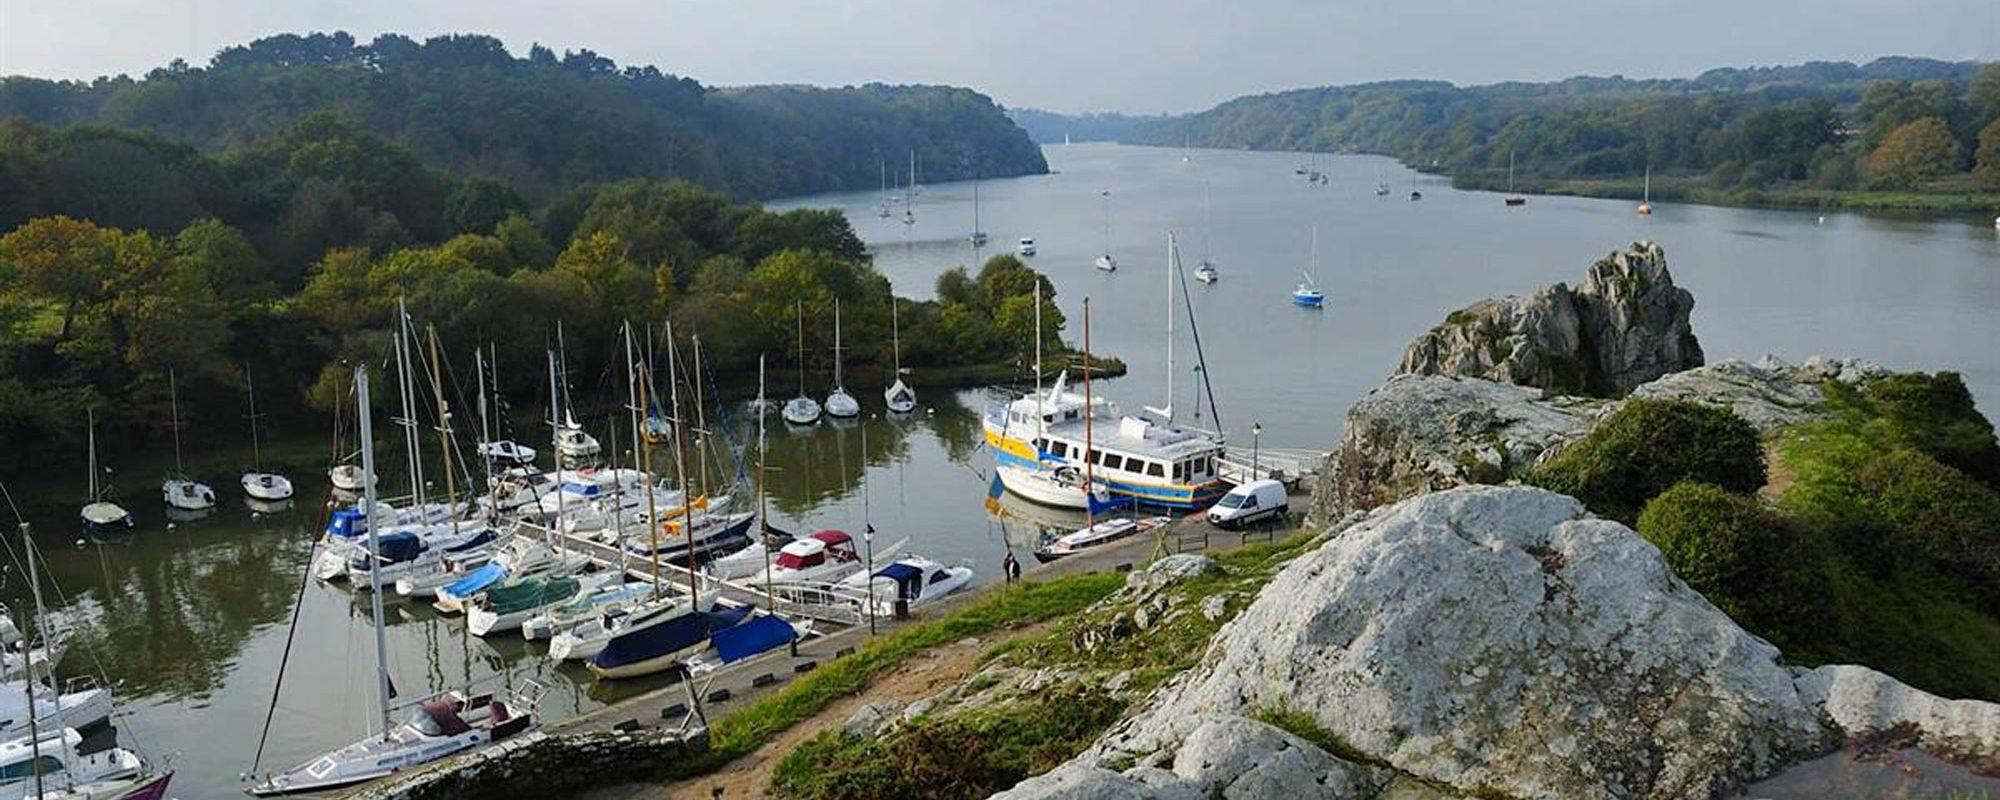 le port de la Roche Bernard à proximité du camping Pont Mahé